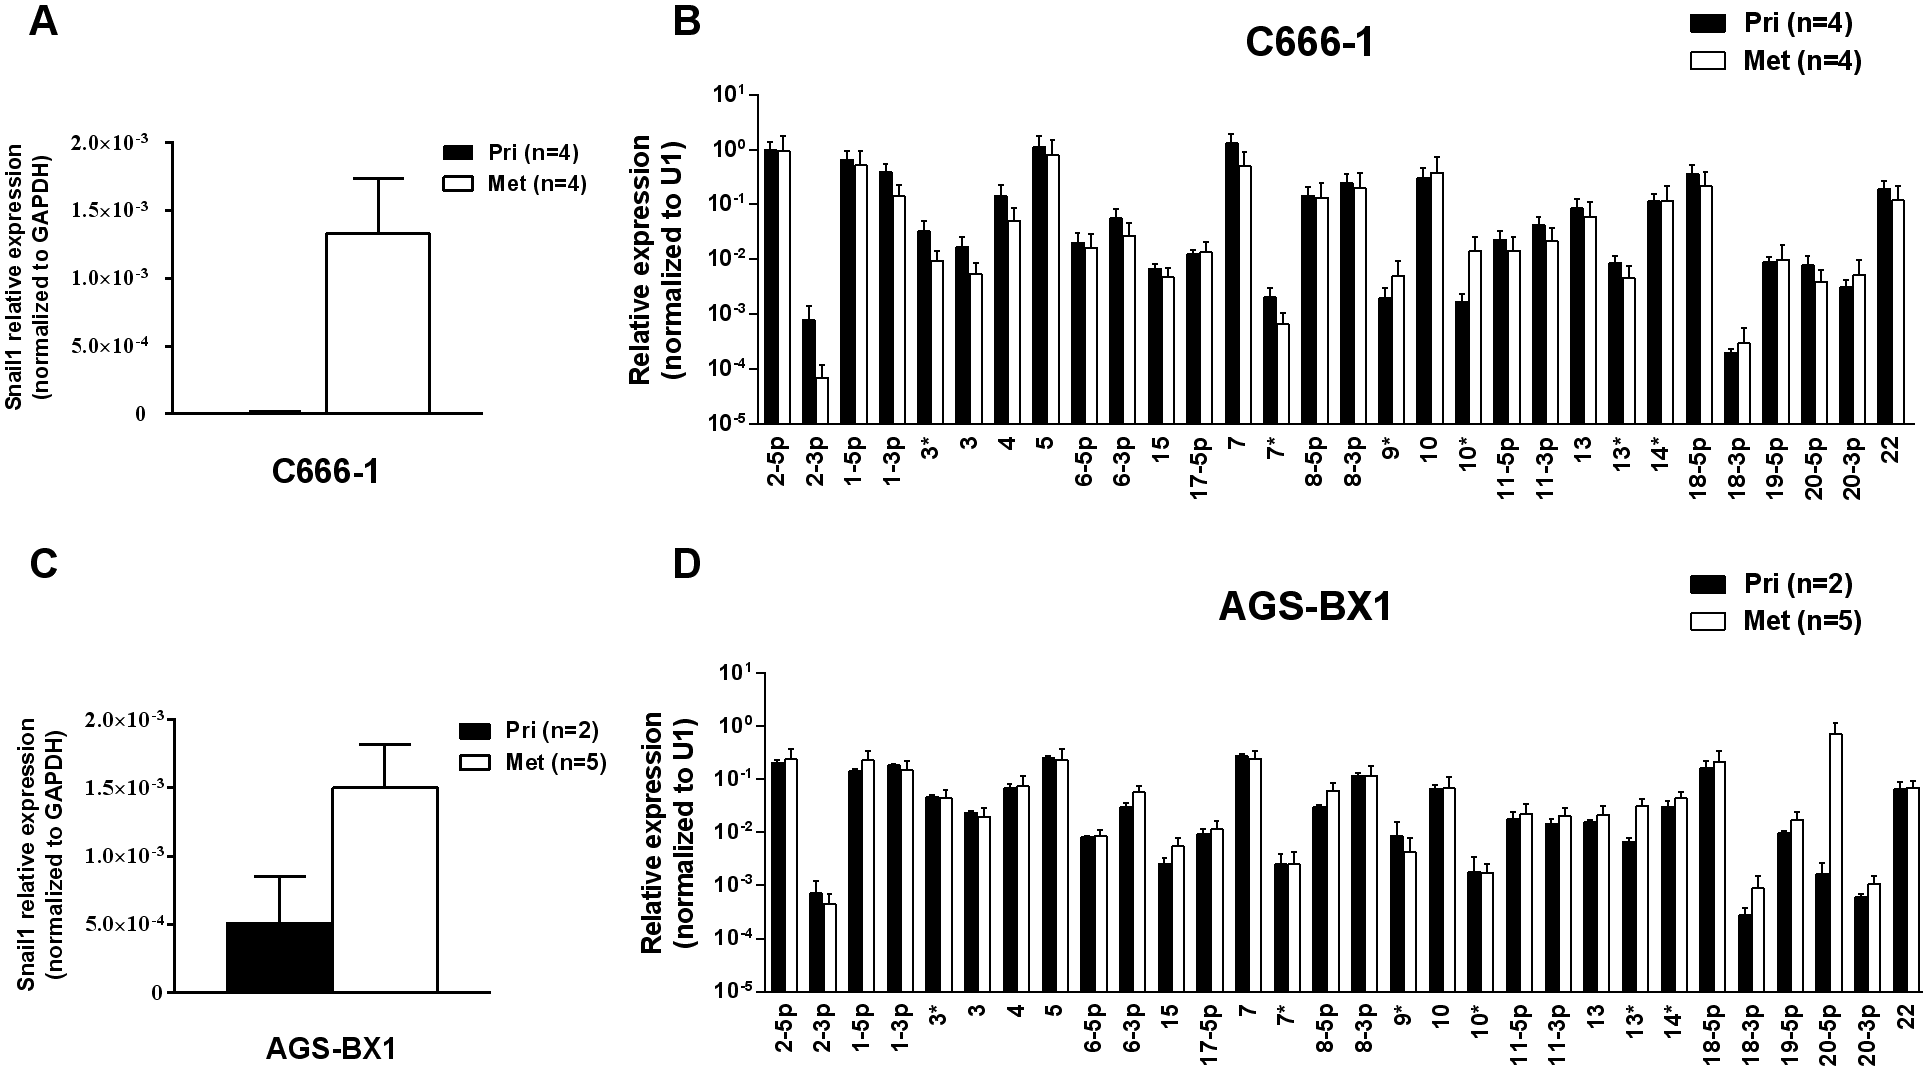 BART miRNA expression does not change in metastasis.